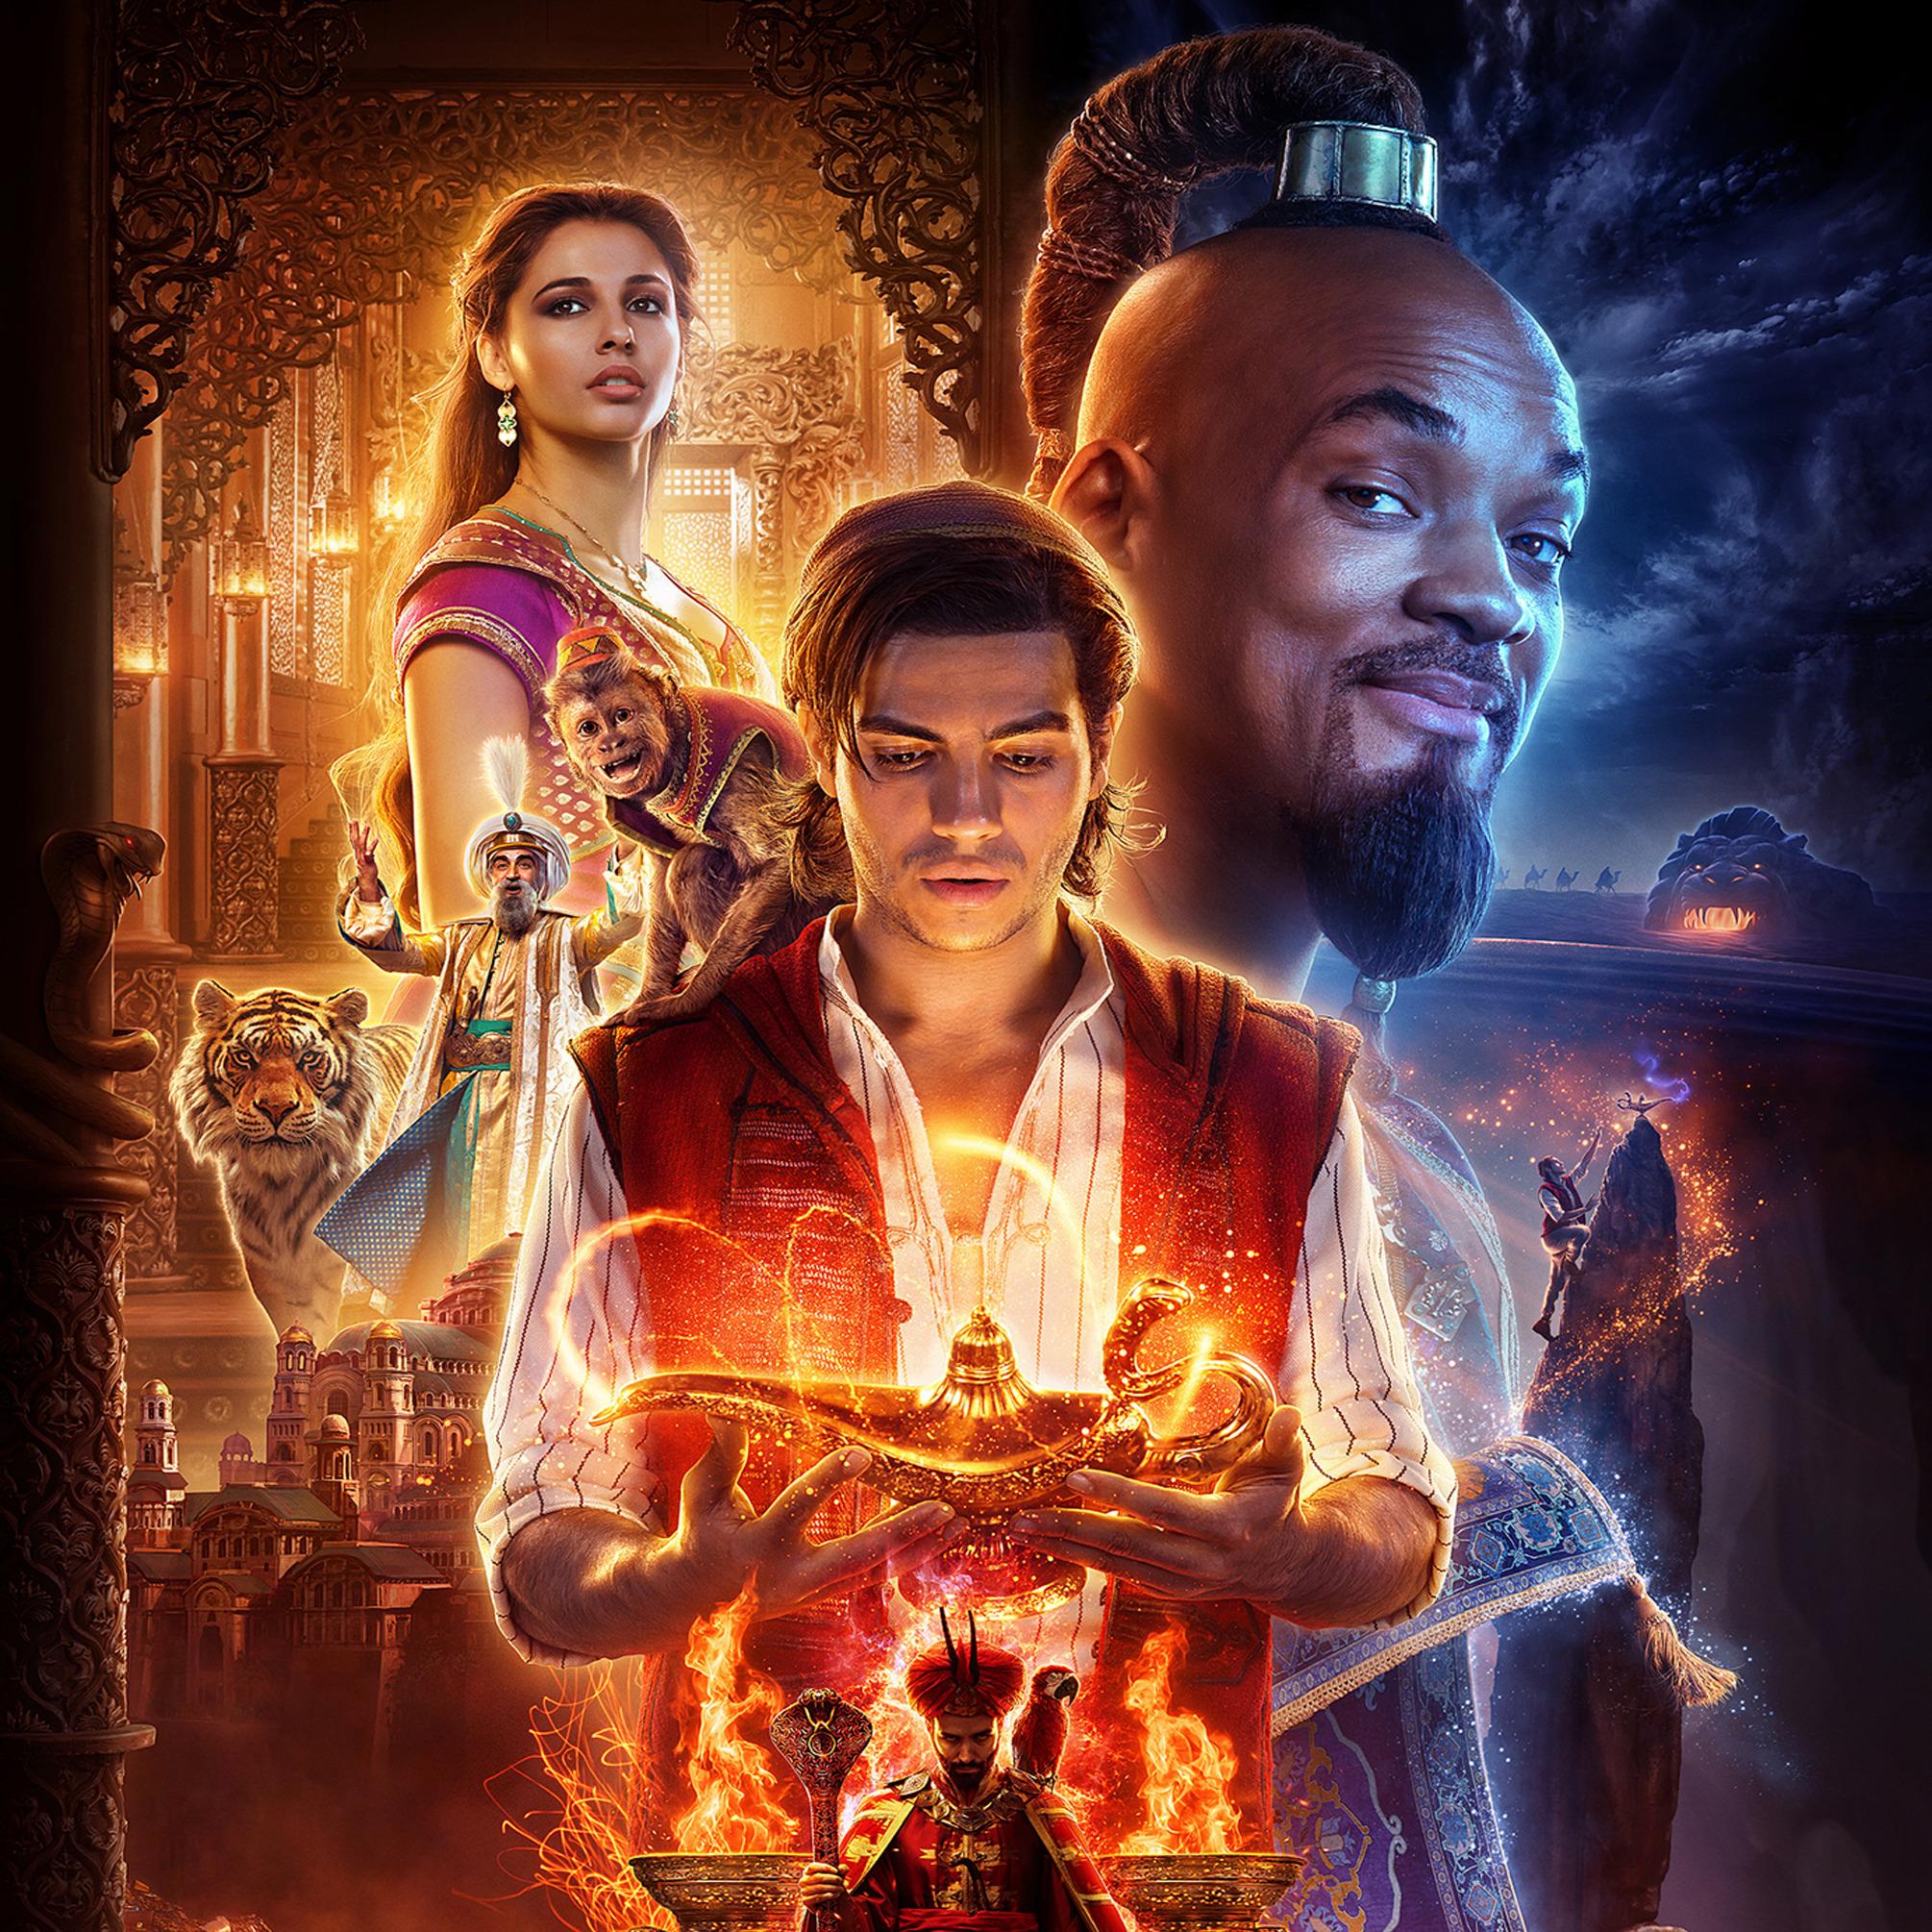 Aladdin 2019 نقد و بررسی فیلم